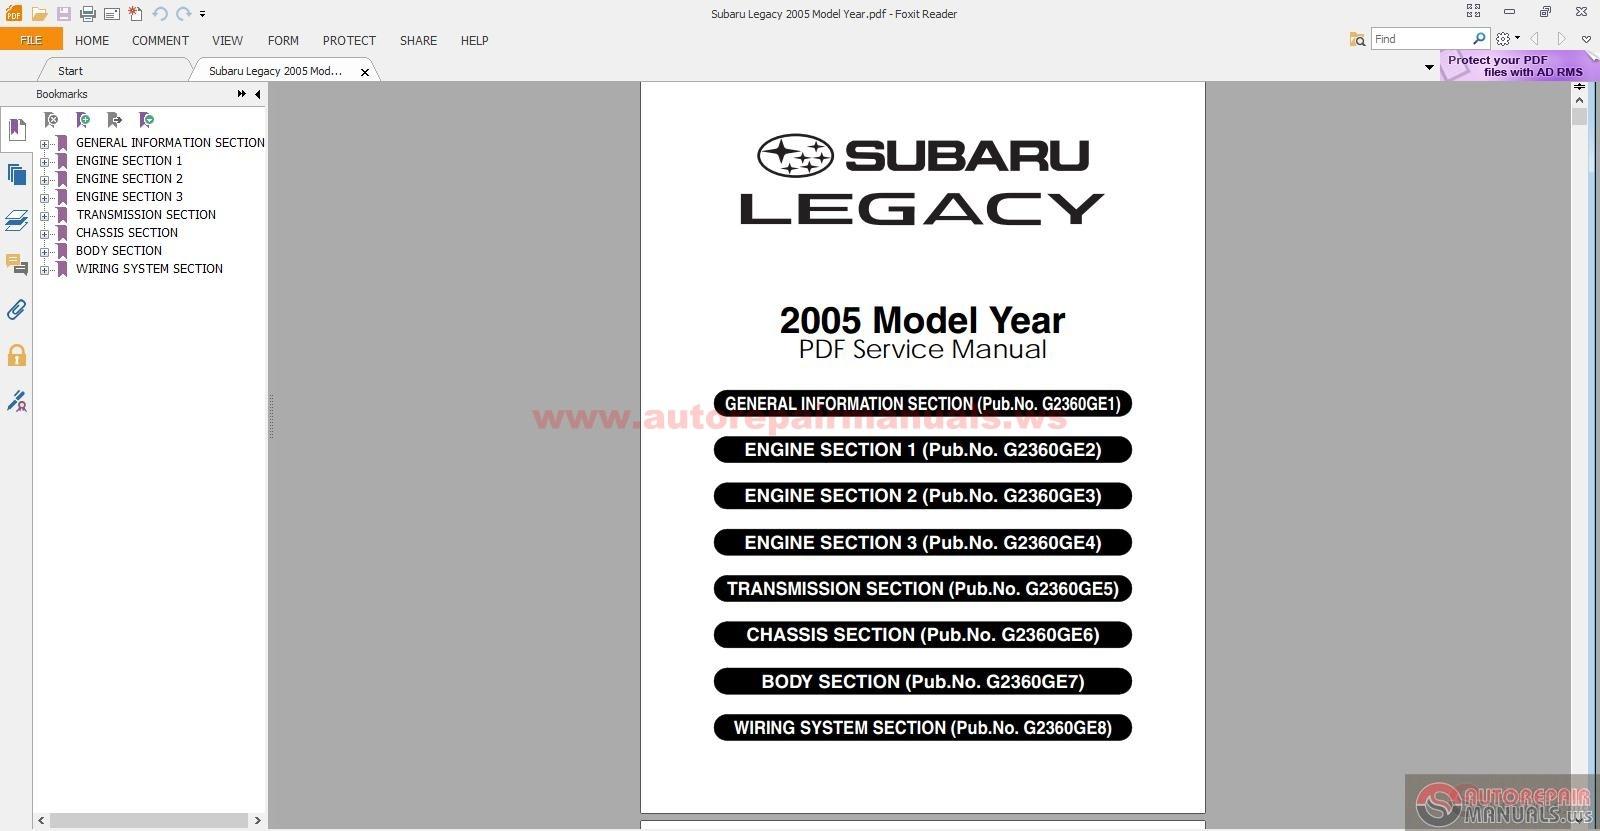 subaru legacy 2005 model year auto repair manual forum. Black Bedroom Furniture Sets. Home Design Ideas